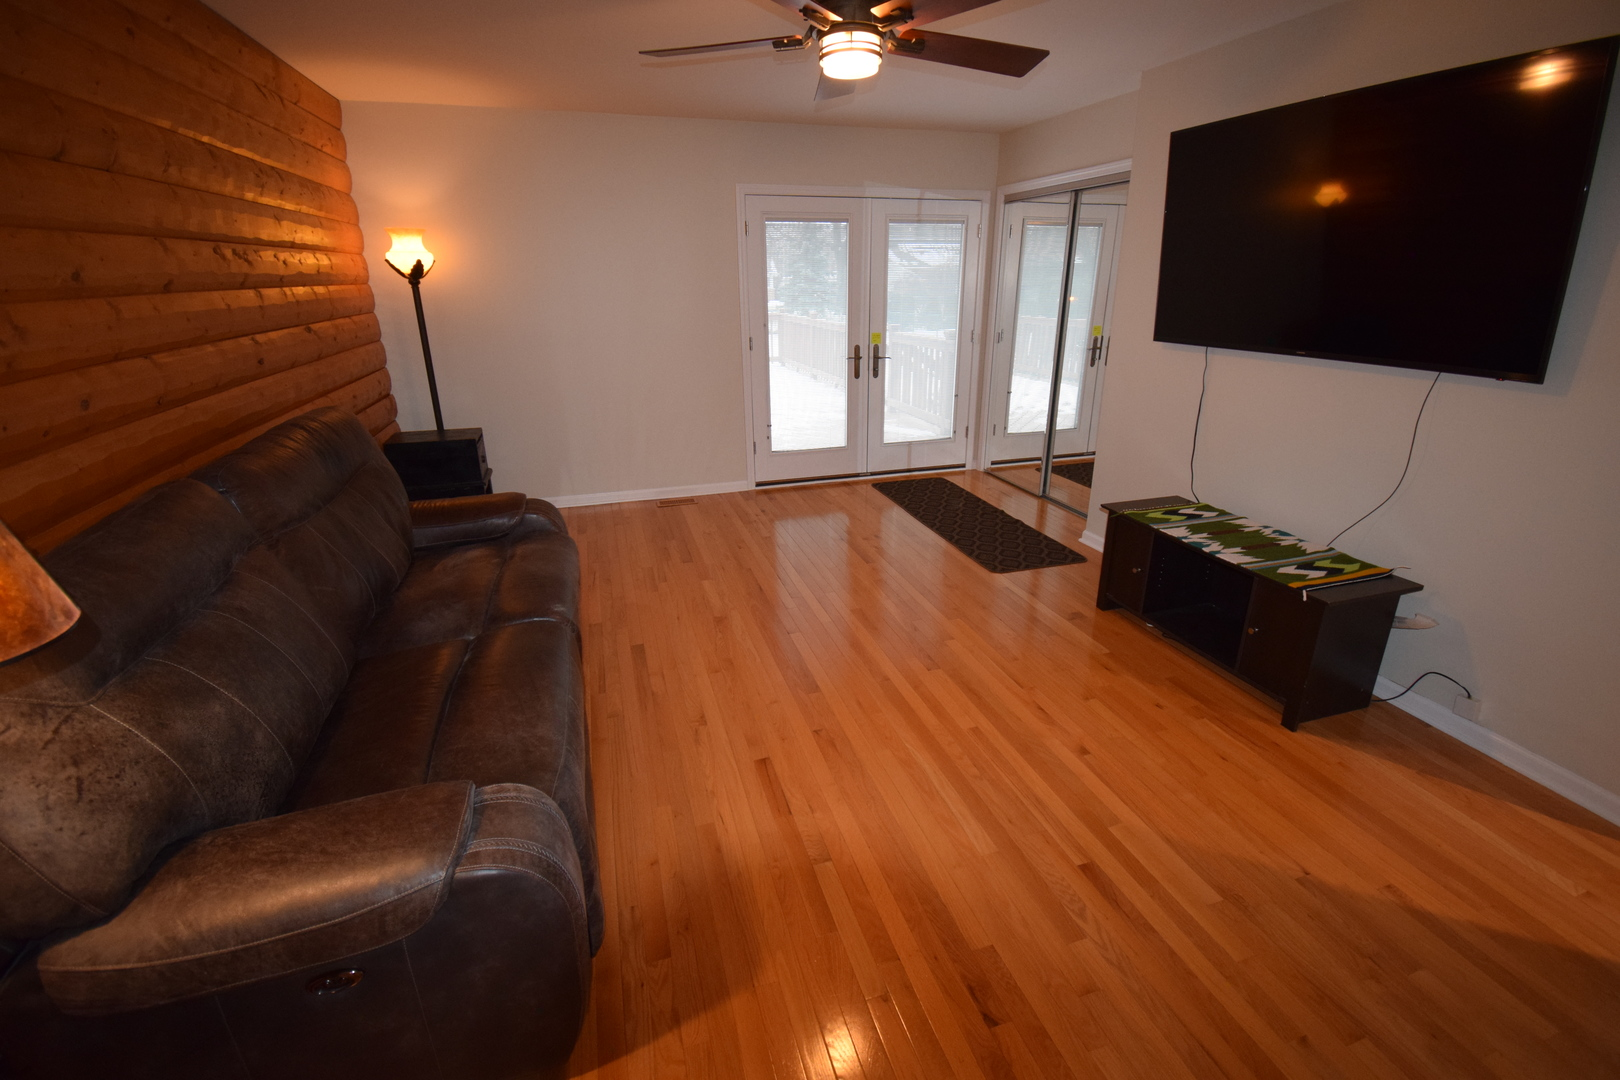 8109 Courtland ,Norridge, Illinois 60706